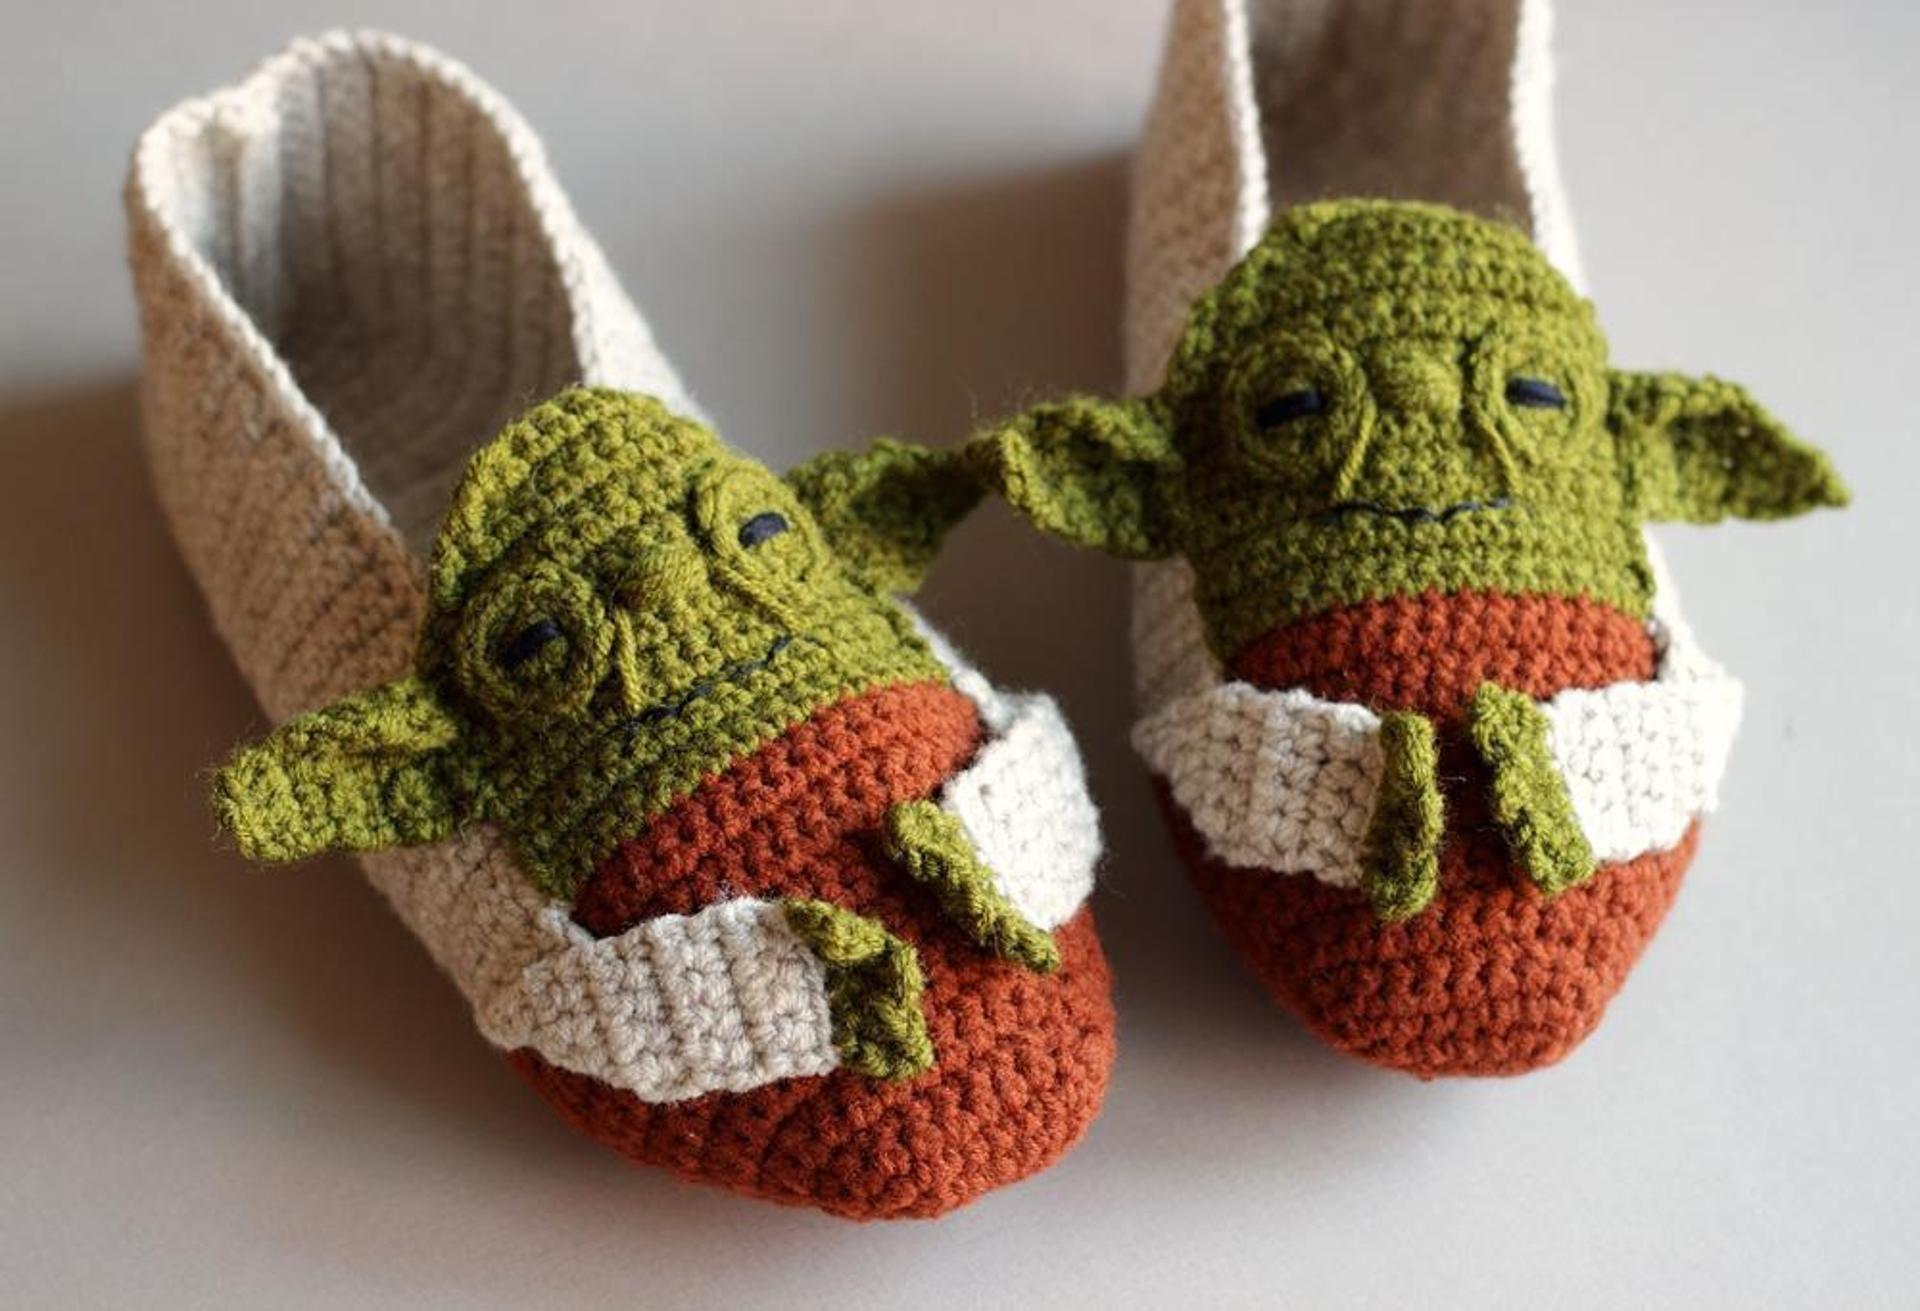 Star Wars Yoda Crochet Slippers | Kids Knits | Pinterest